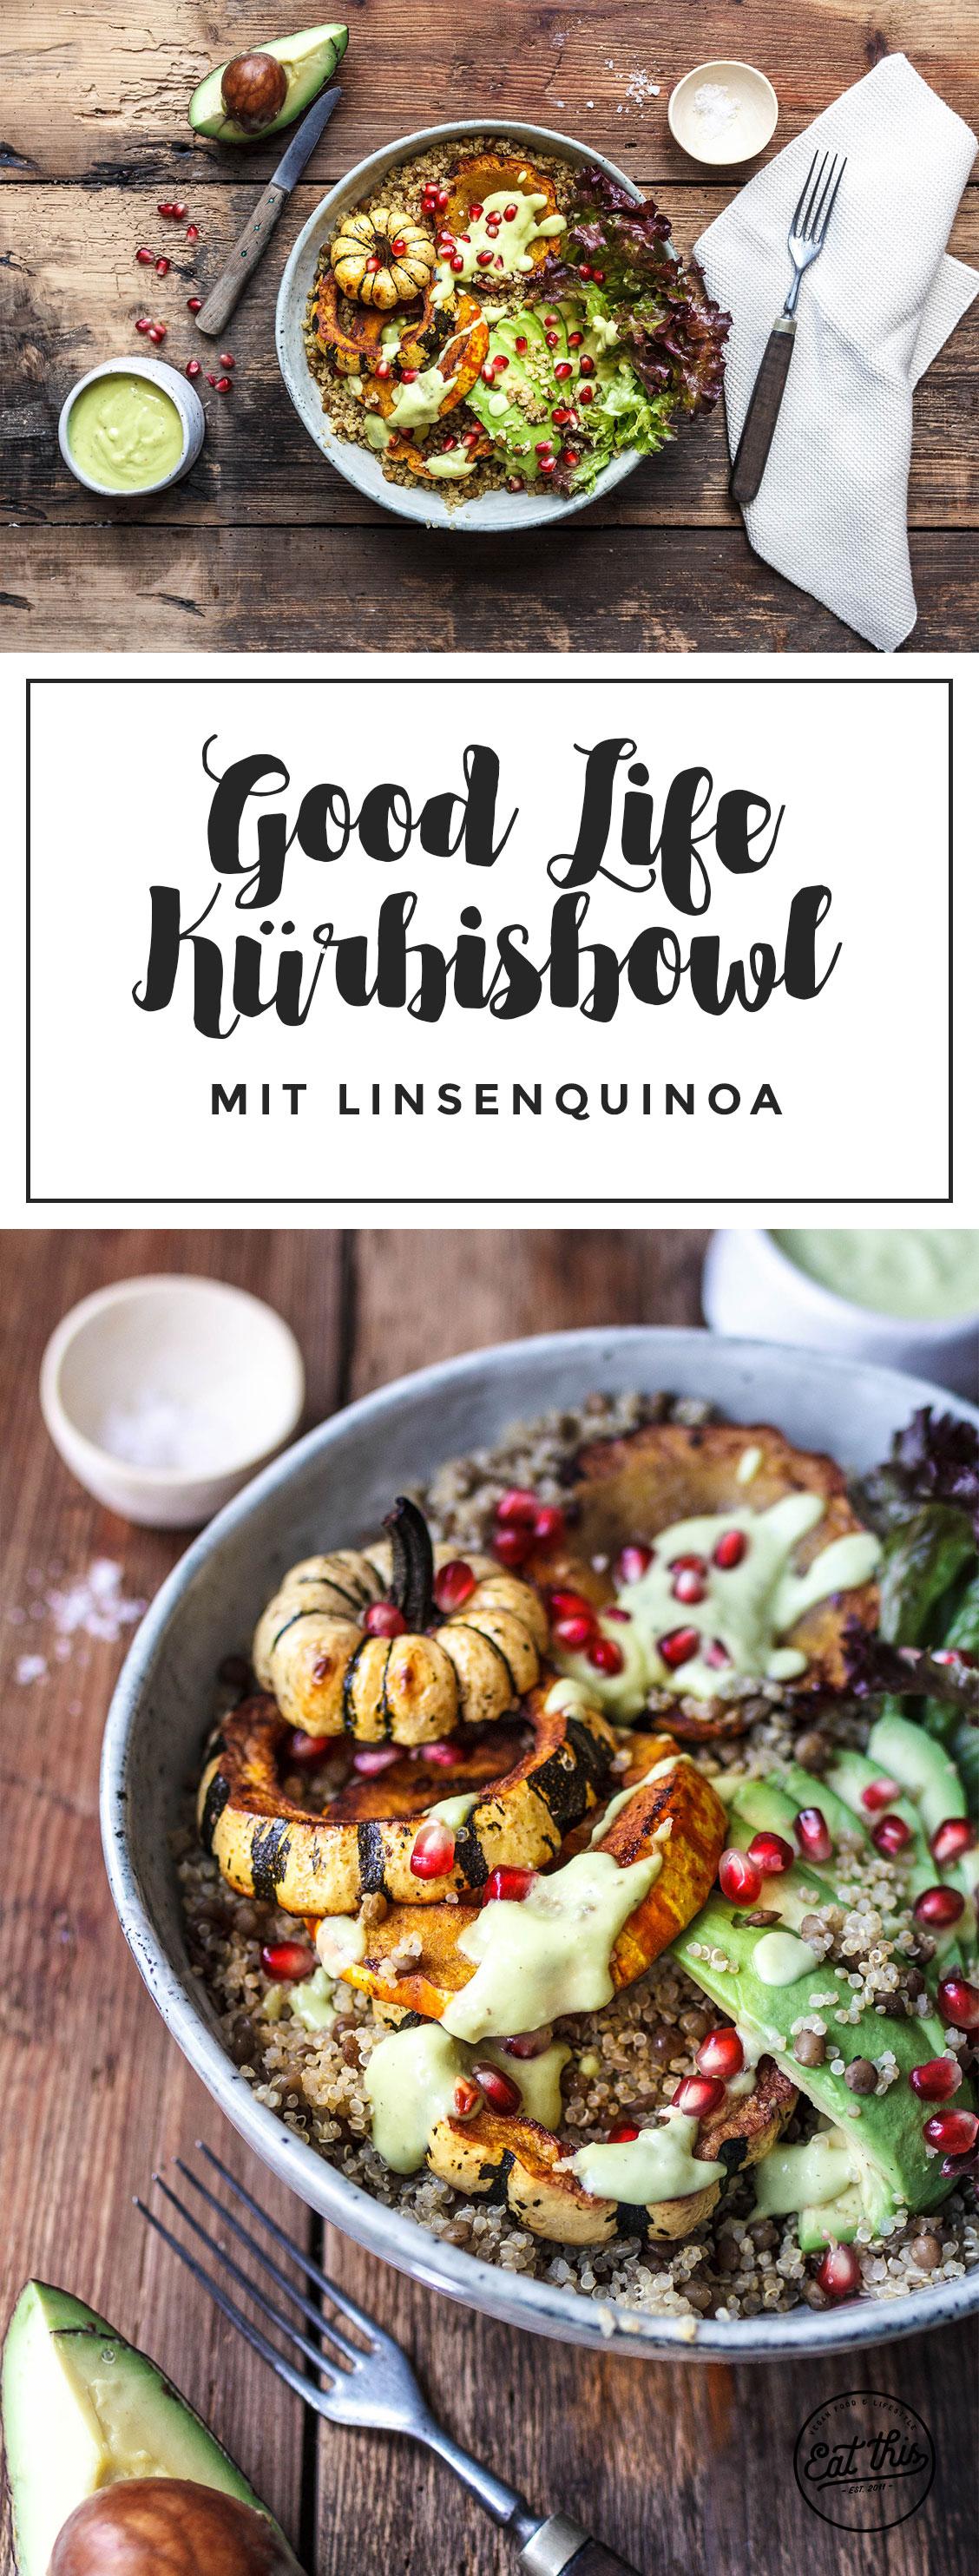 Good Life Kürbisbowl mit Linsenquinoa und kremigem Avocadodressing